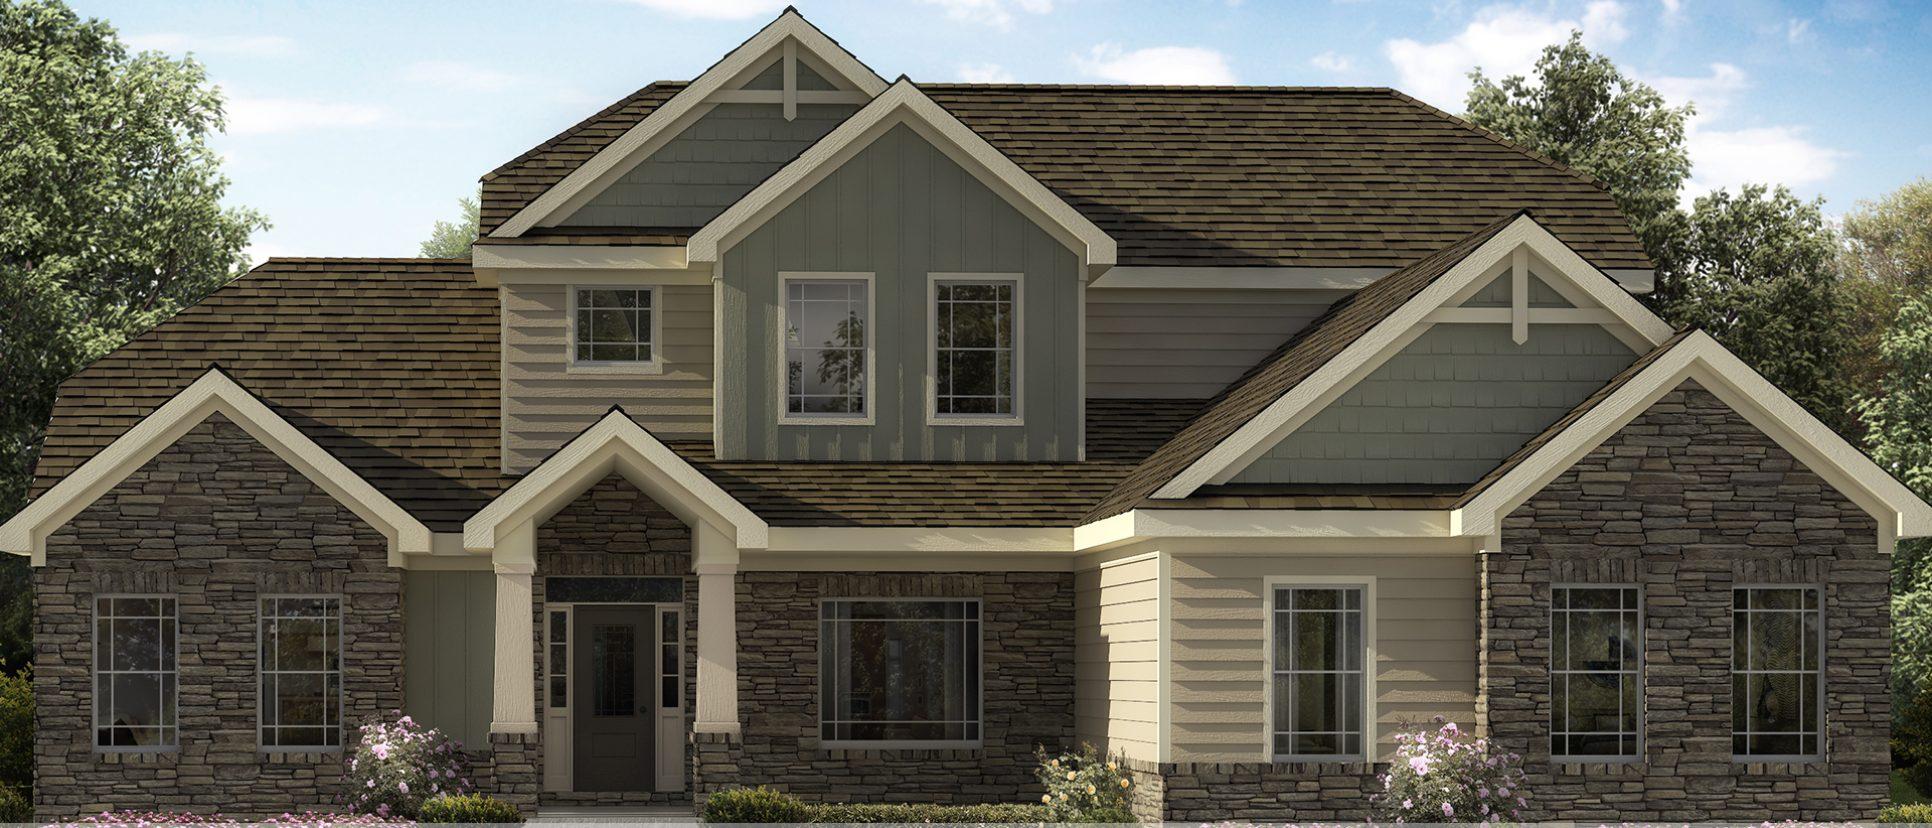 Custom rendering of Lot 49, The Triple Crown in Design Homes owned Bridle Creek Ranch.